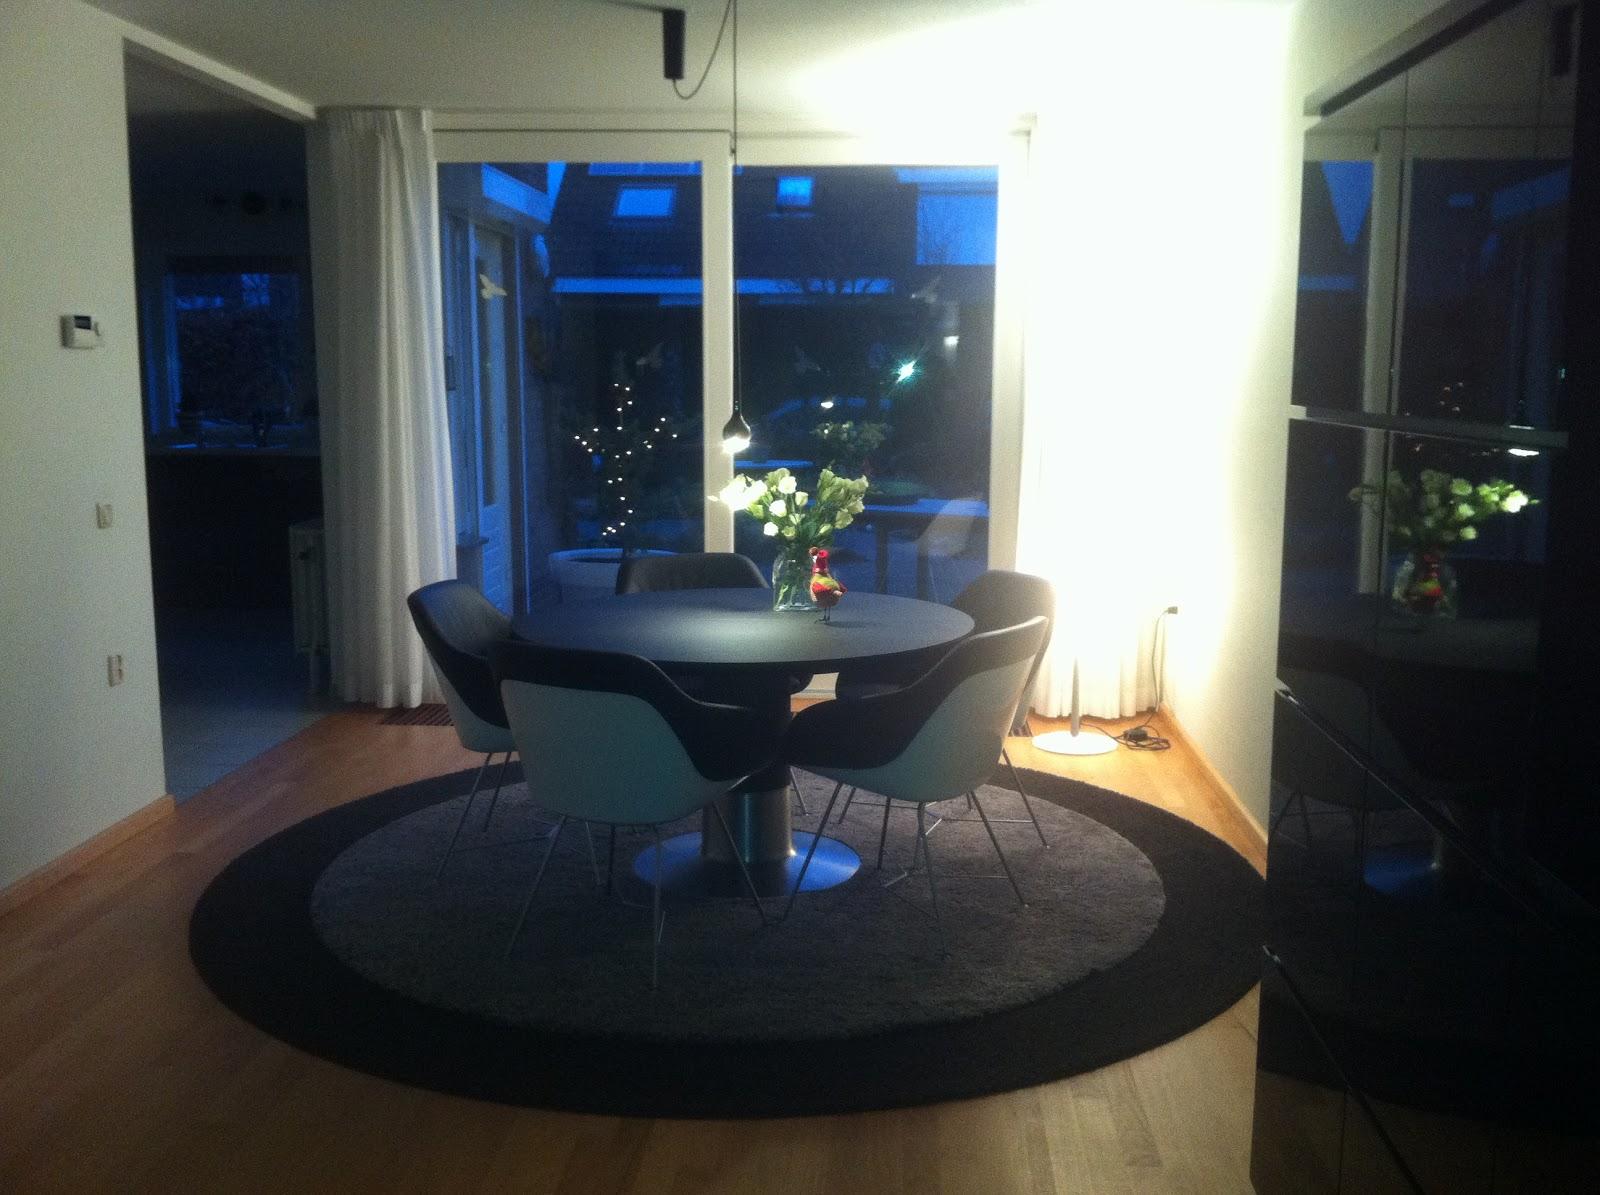 Walter knoll turtle stoelen en arco balance tafel for Eetkamerstoelen kuipmodel